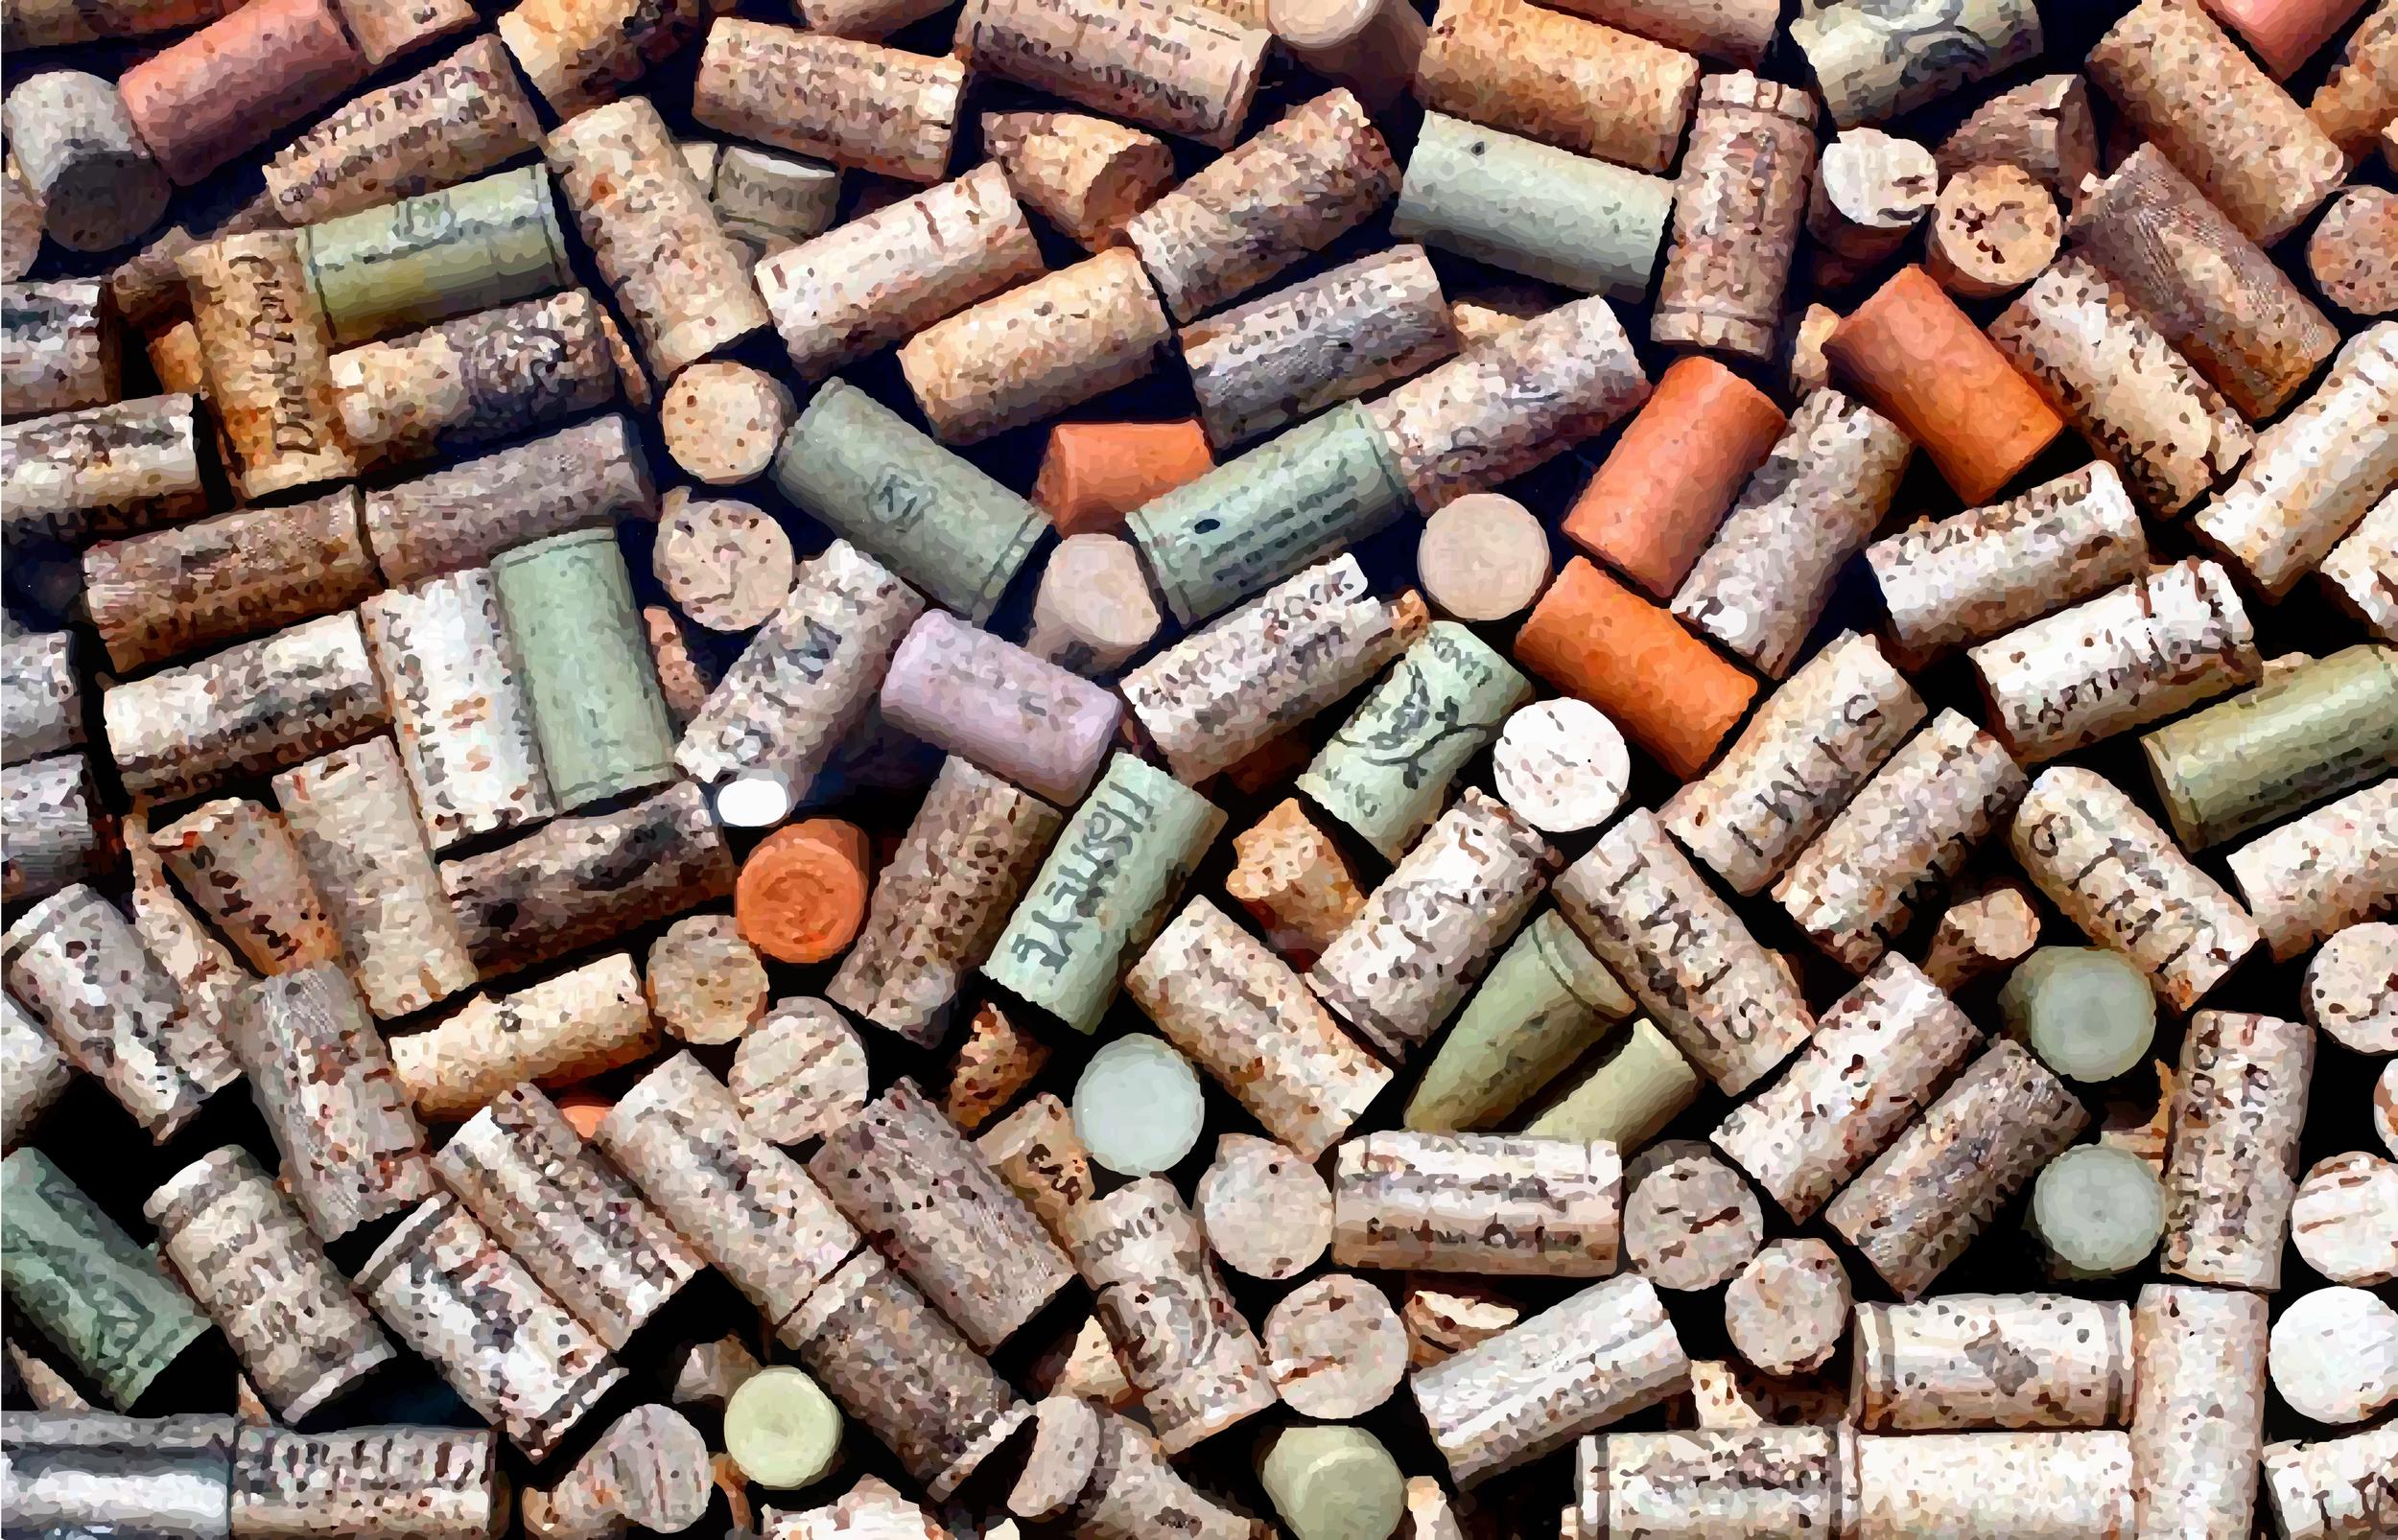 corks.jpg